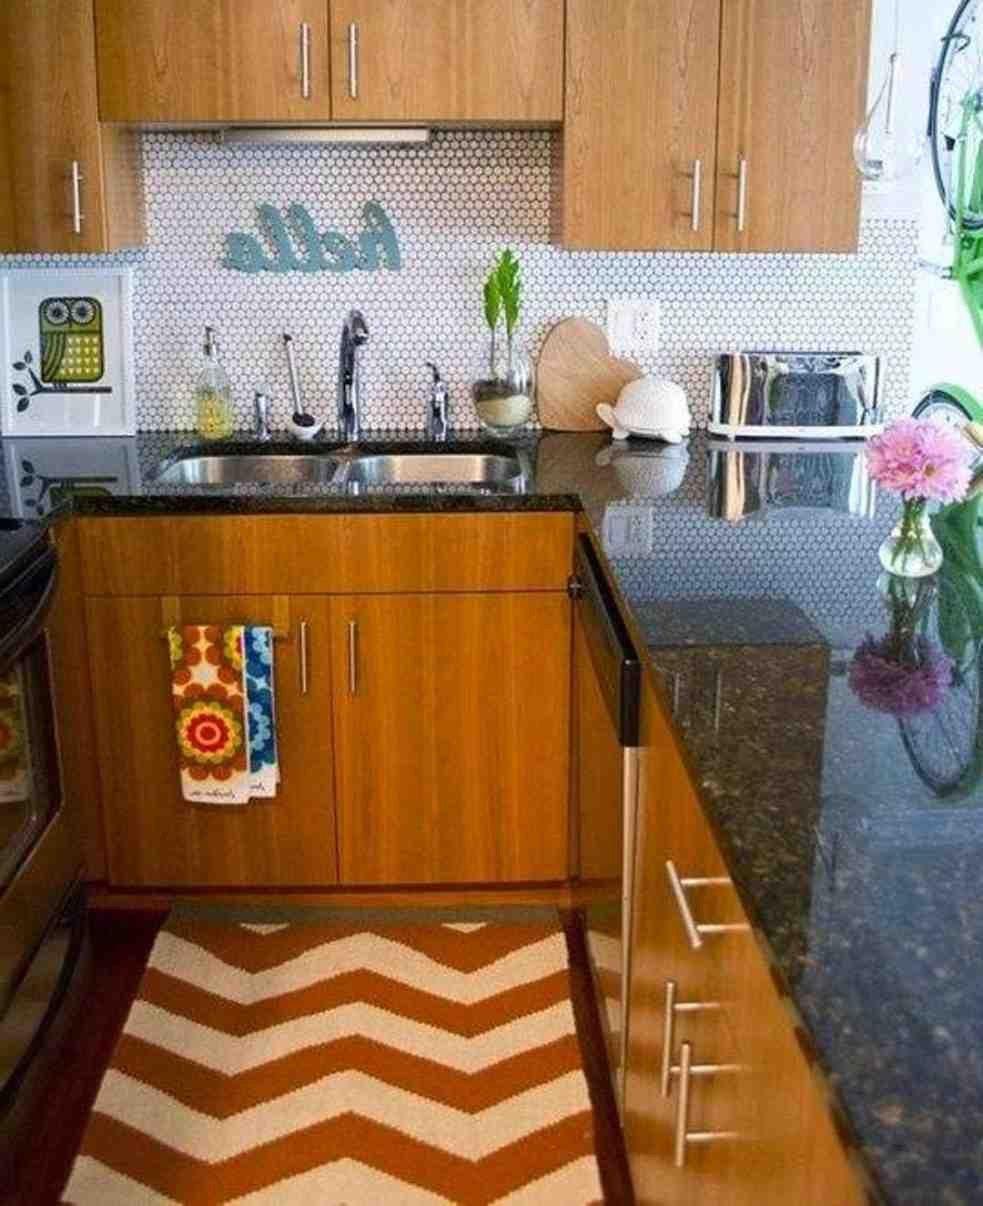 Kitchen Decor Ideas for Apartment Luxury Small Apartment Kitchen Decorating Ideas Decor Ideasdecor Ideas